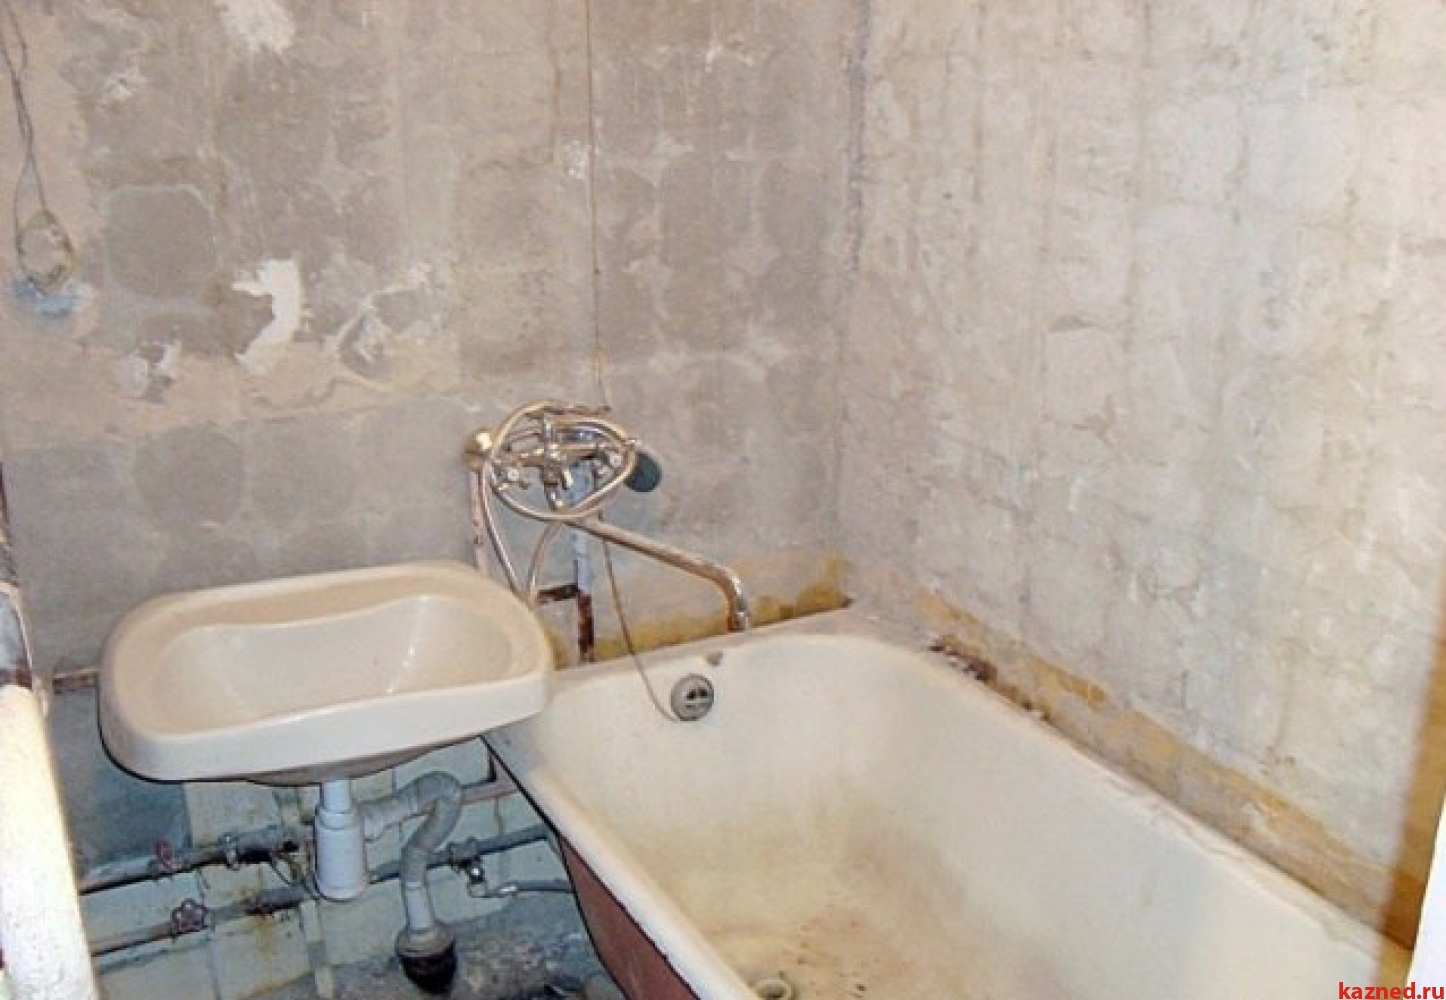 Фото ремонт квартиры своими руками ванная комната